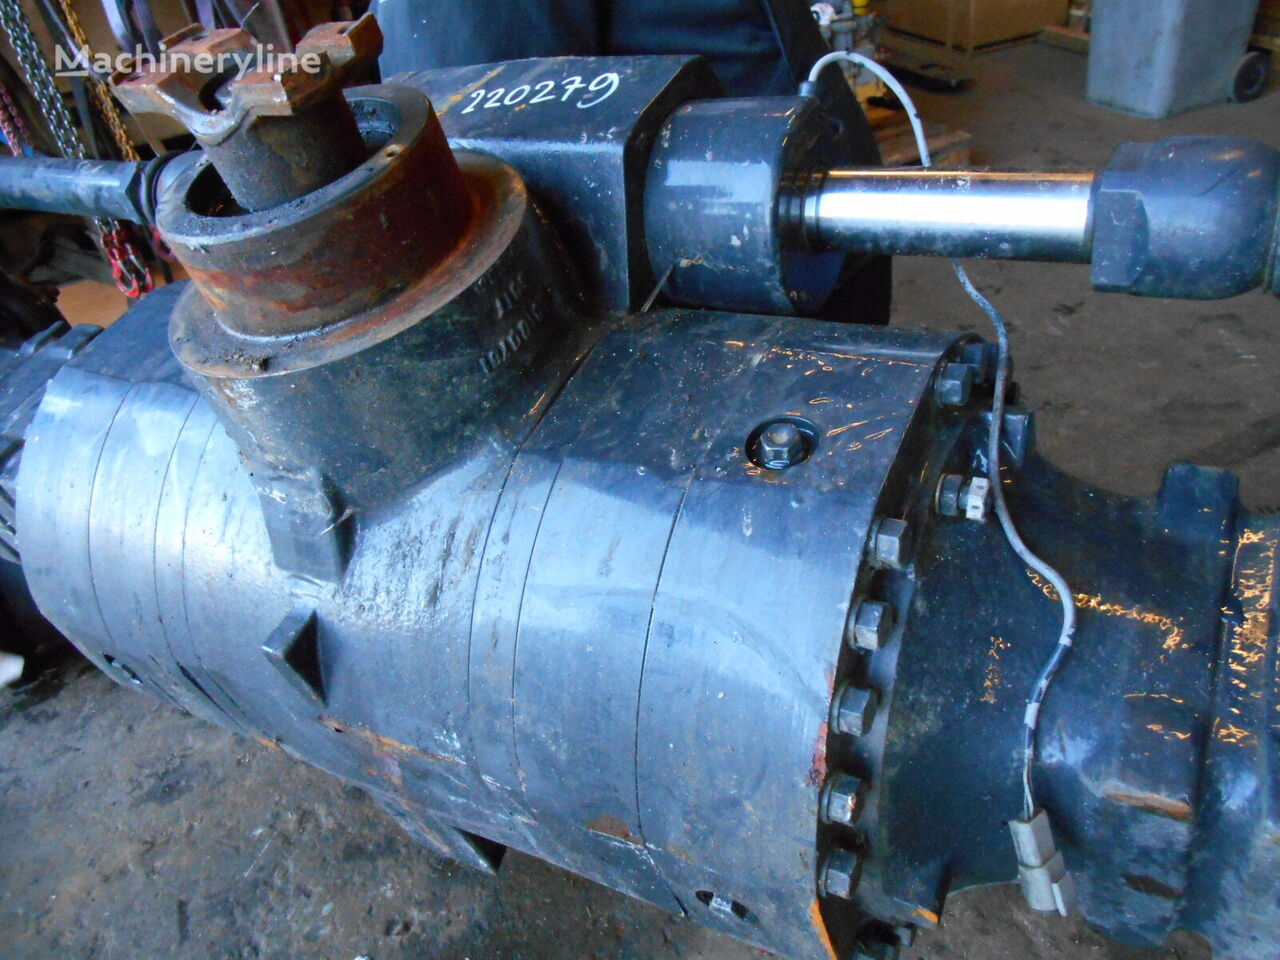 Spicer - Dana 213/159 drive axle for excavator